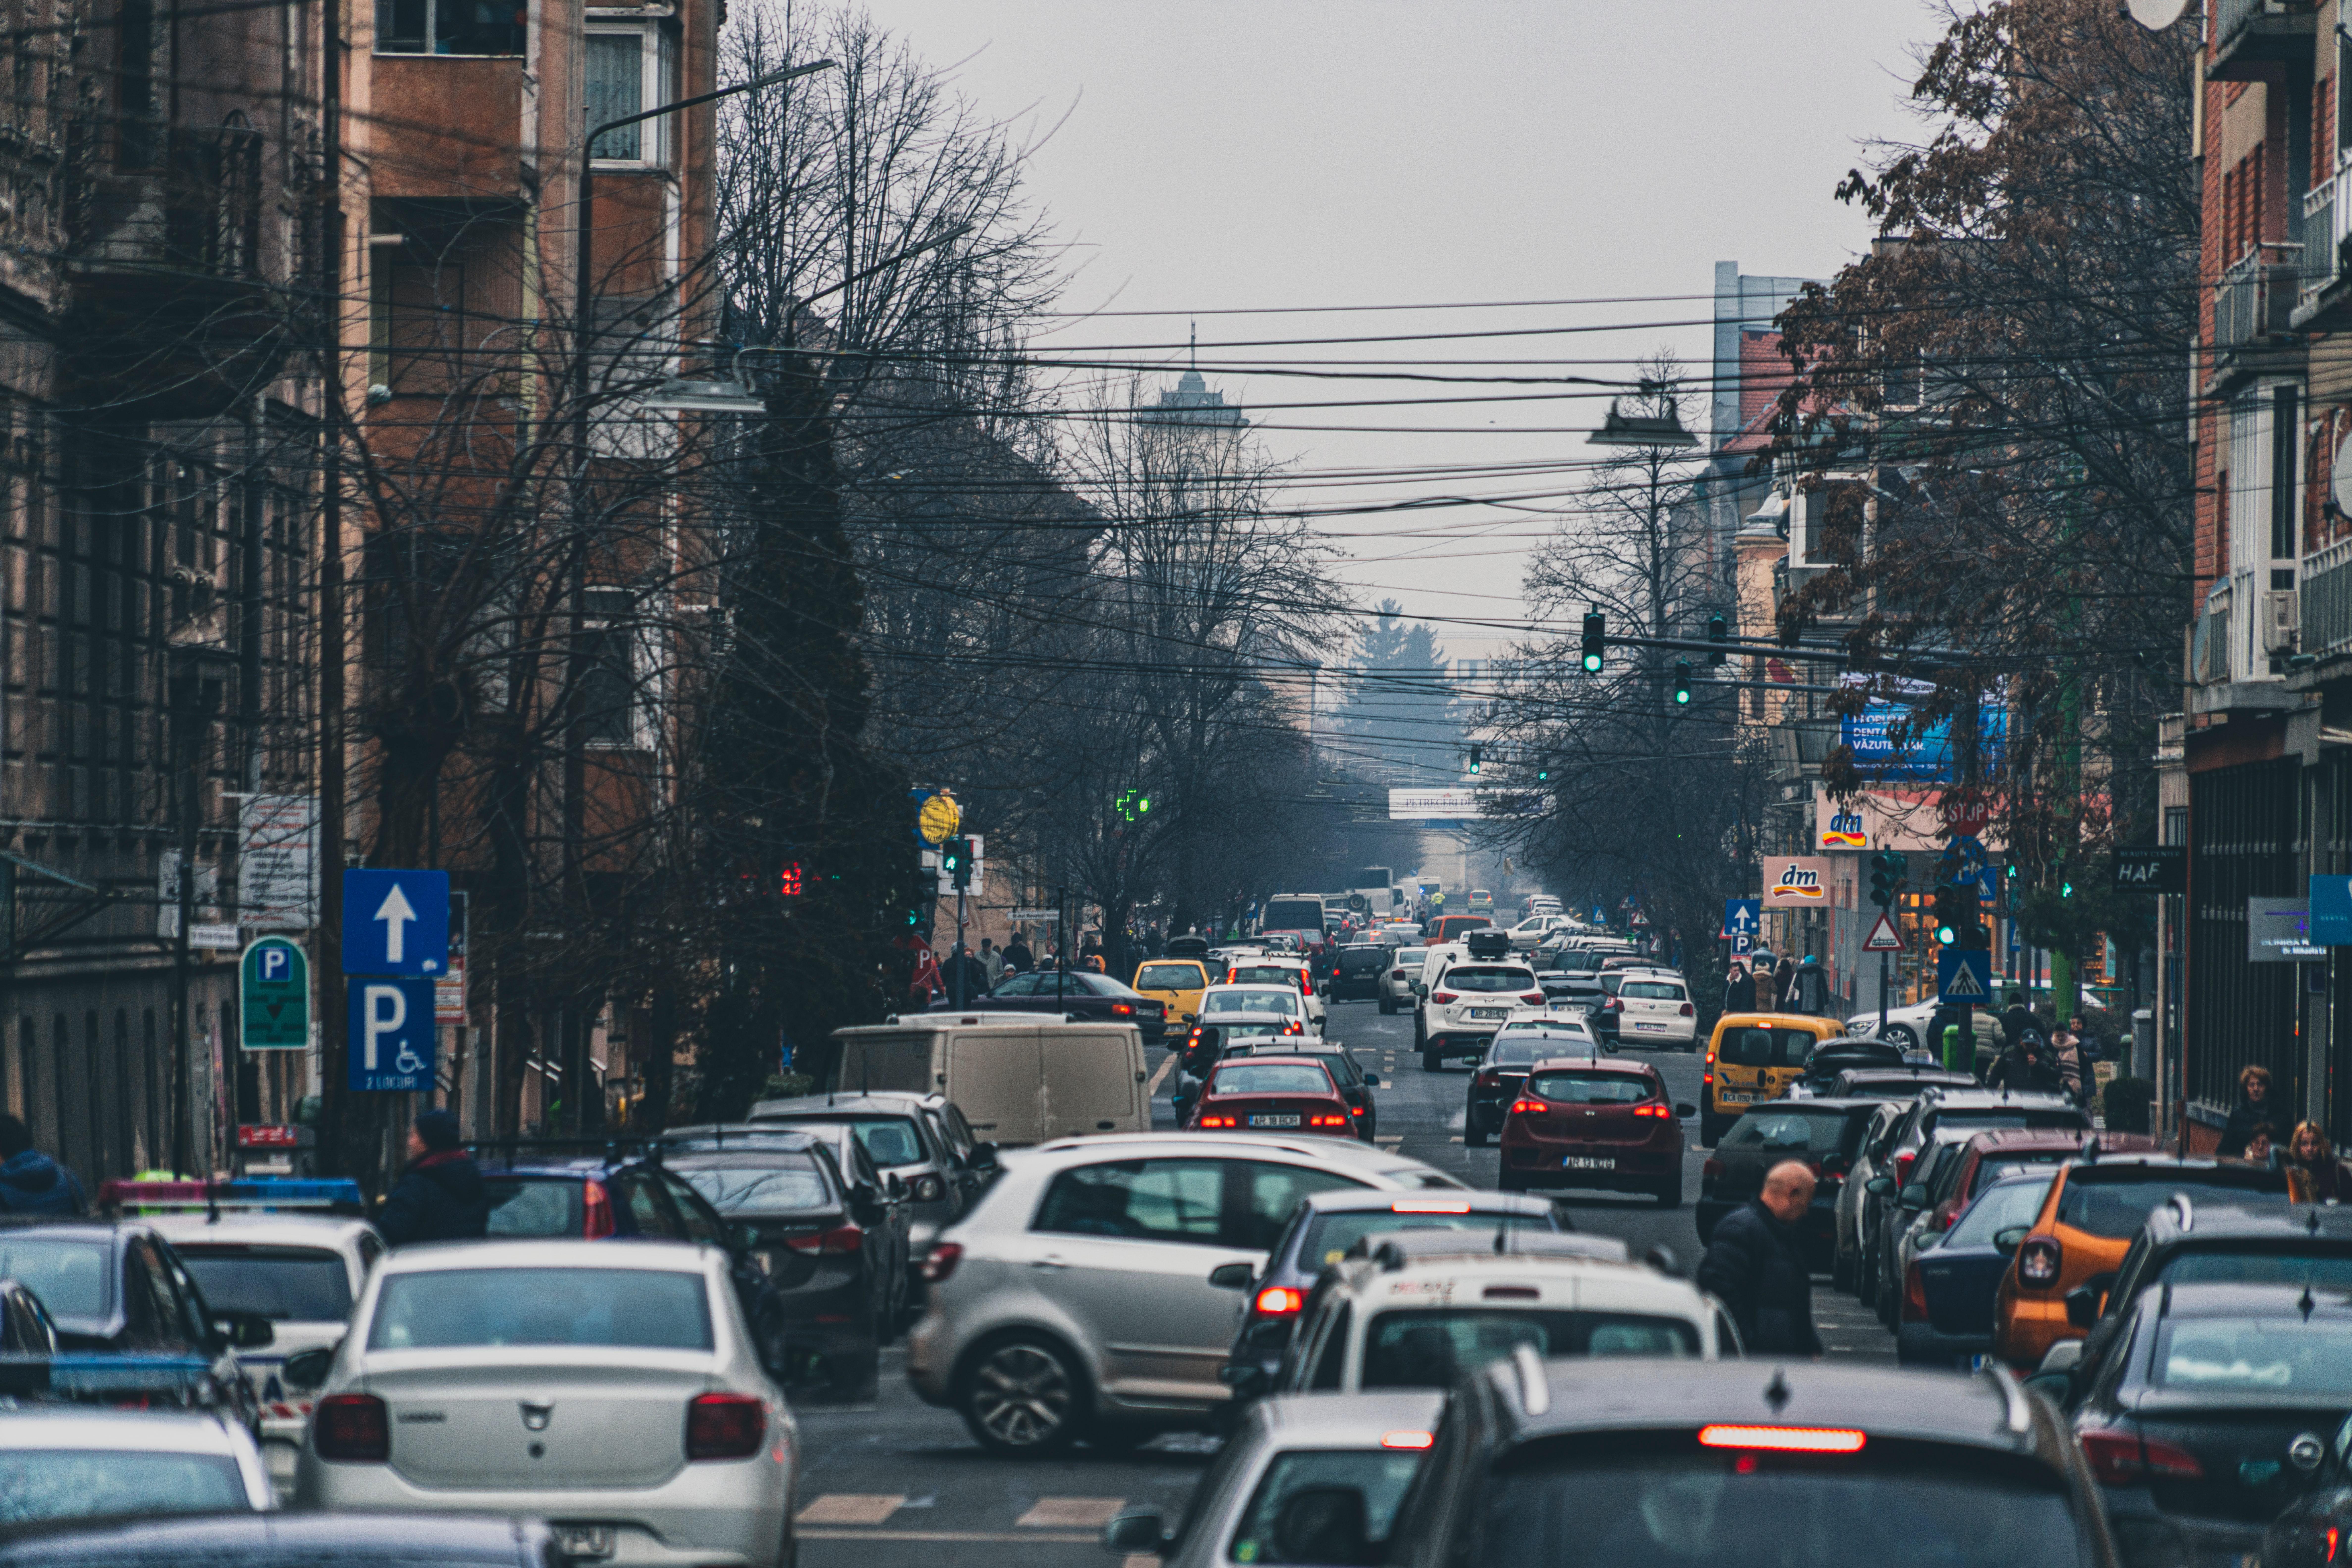 traffic jam representing blocked life force energy